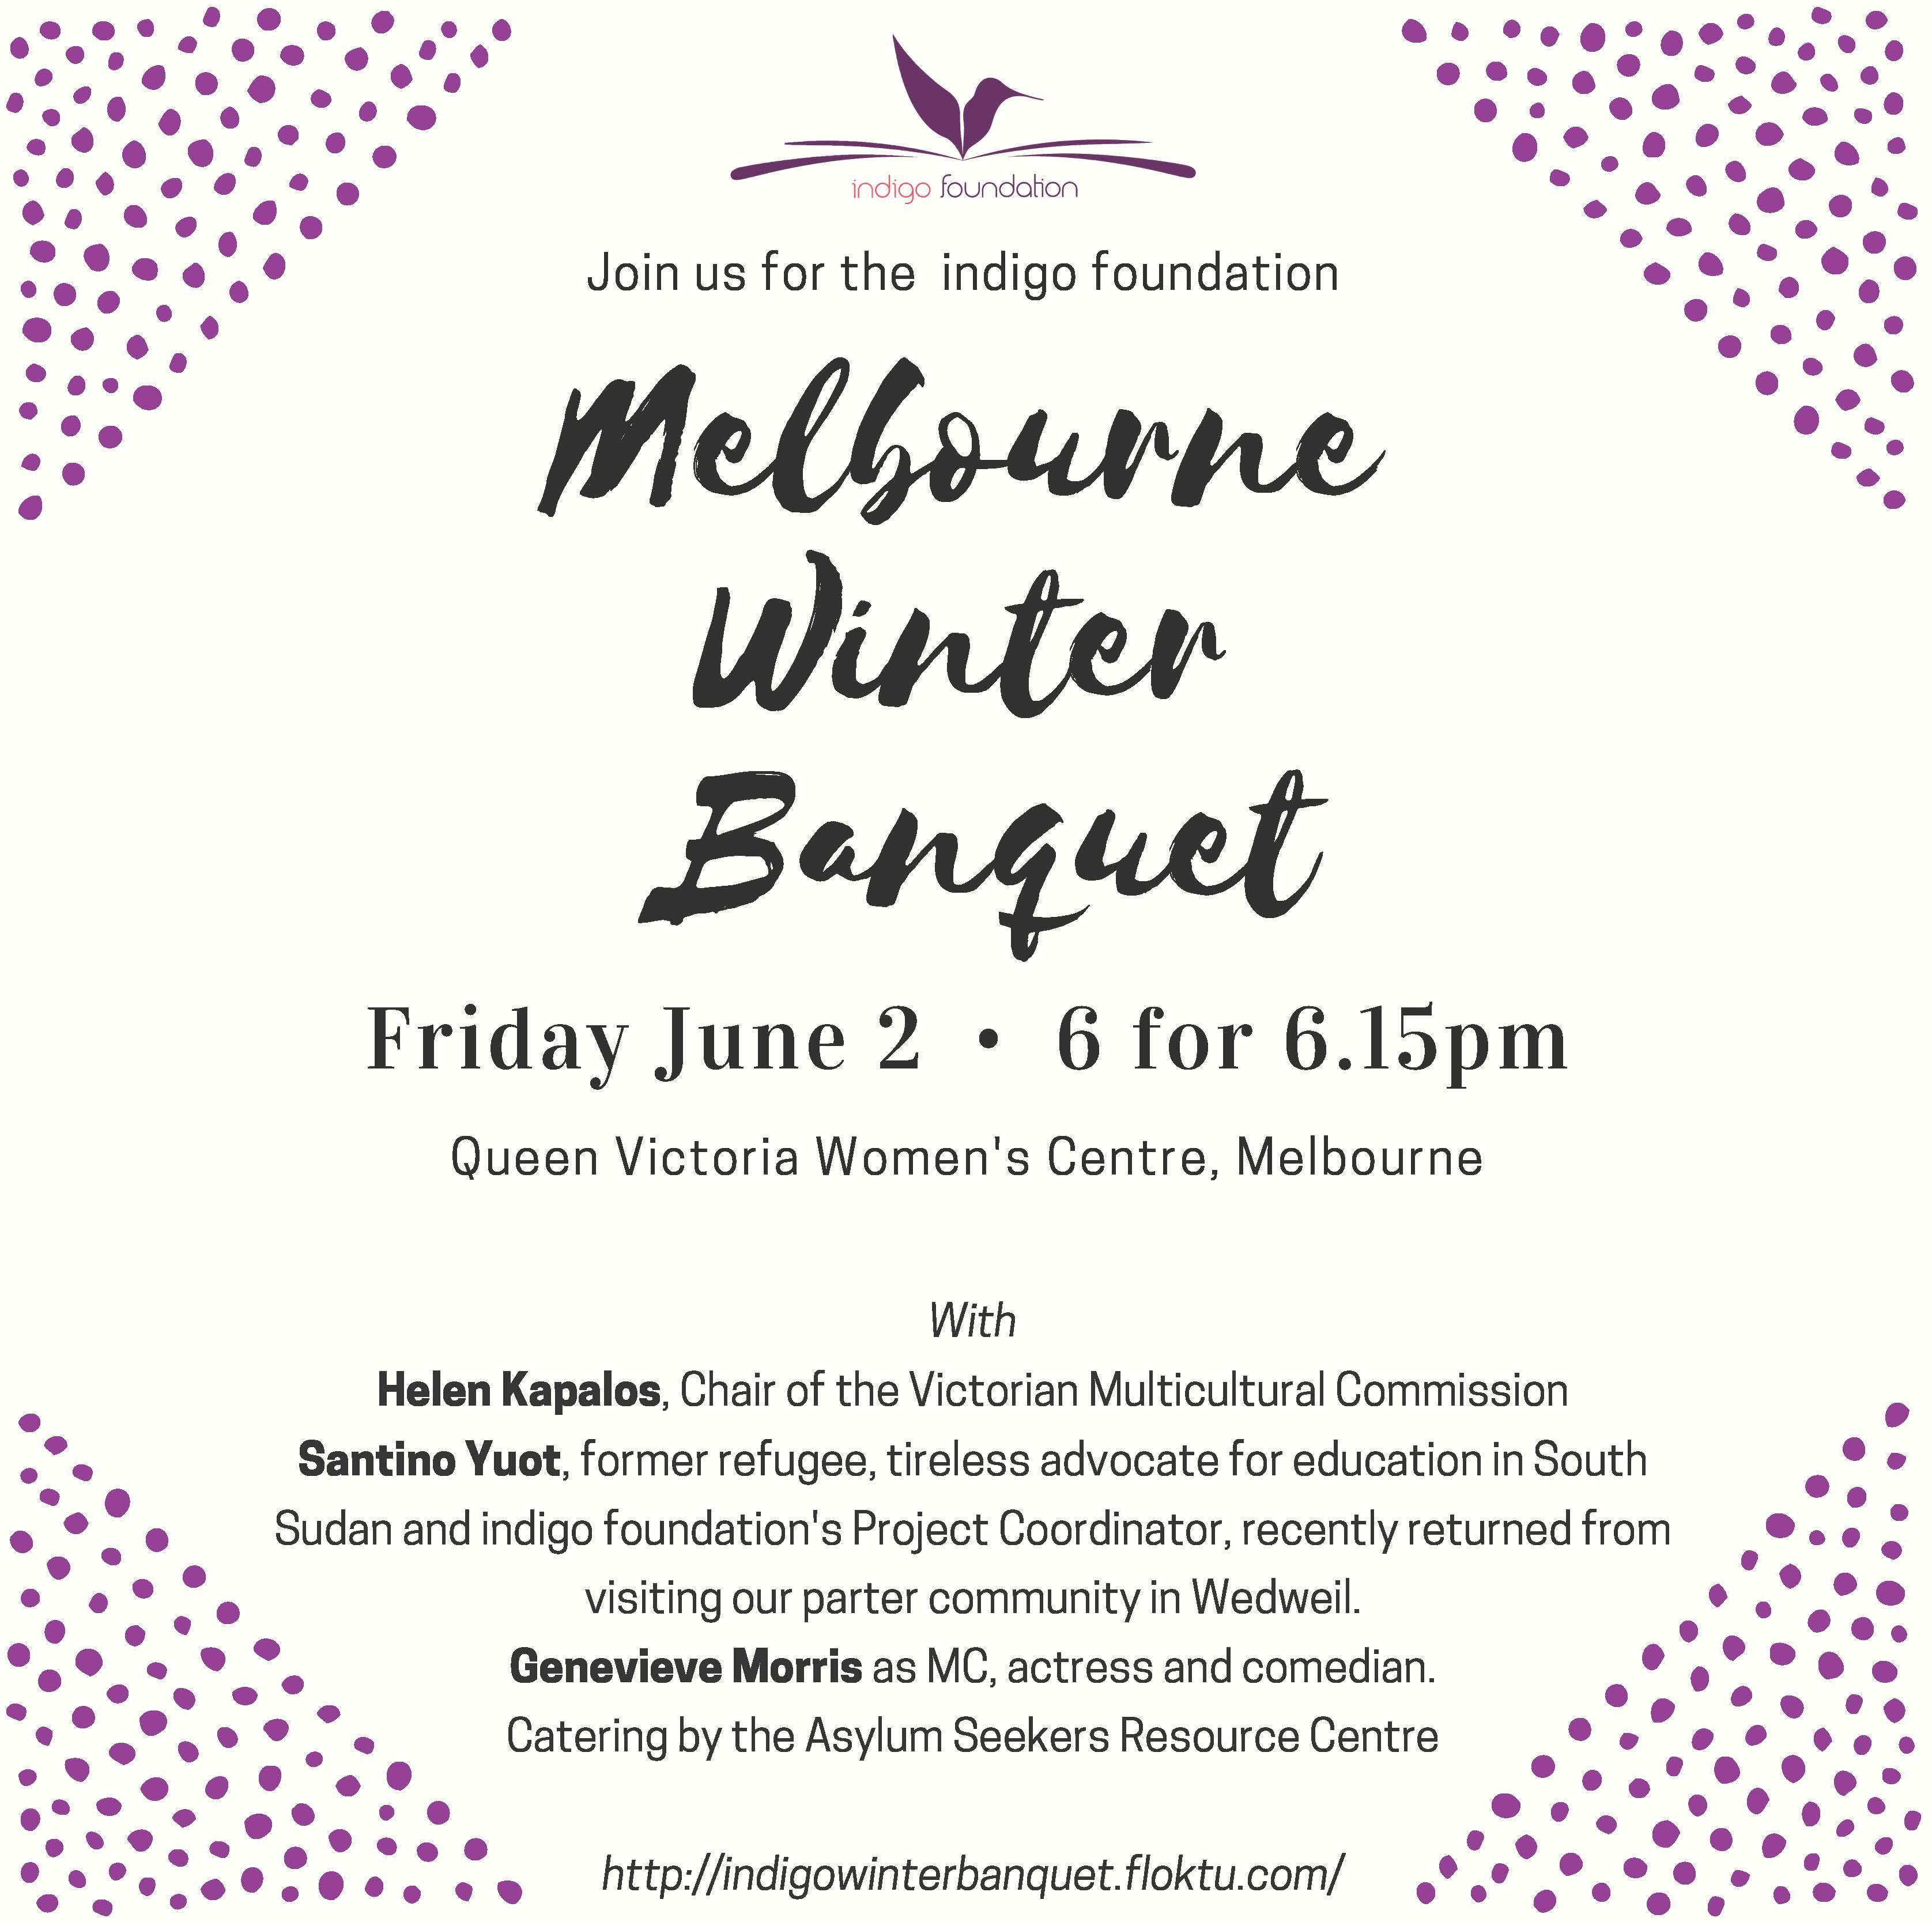 Melbourne dinner